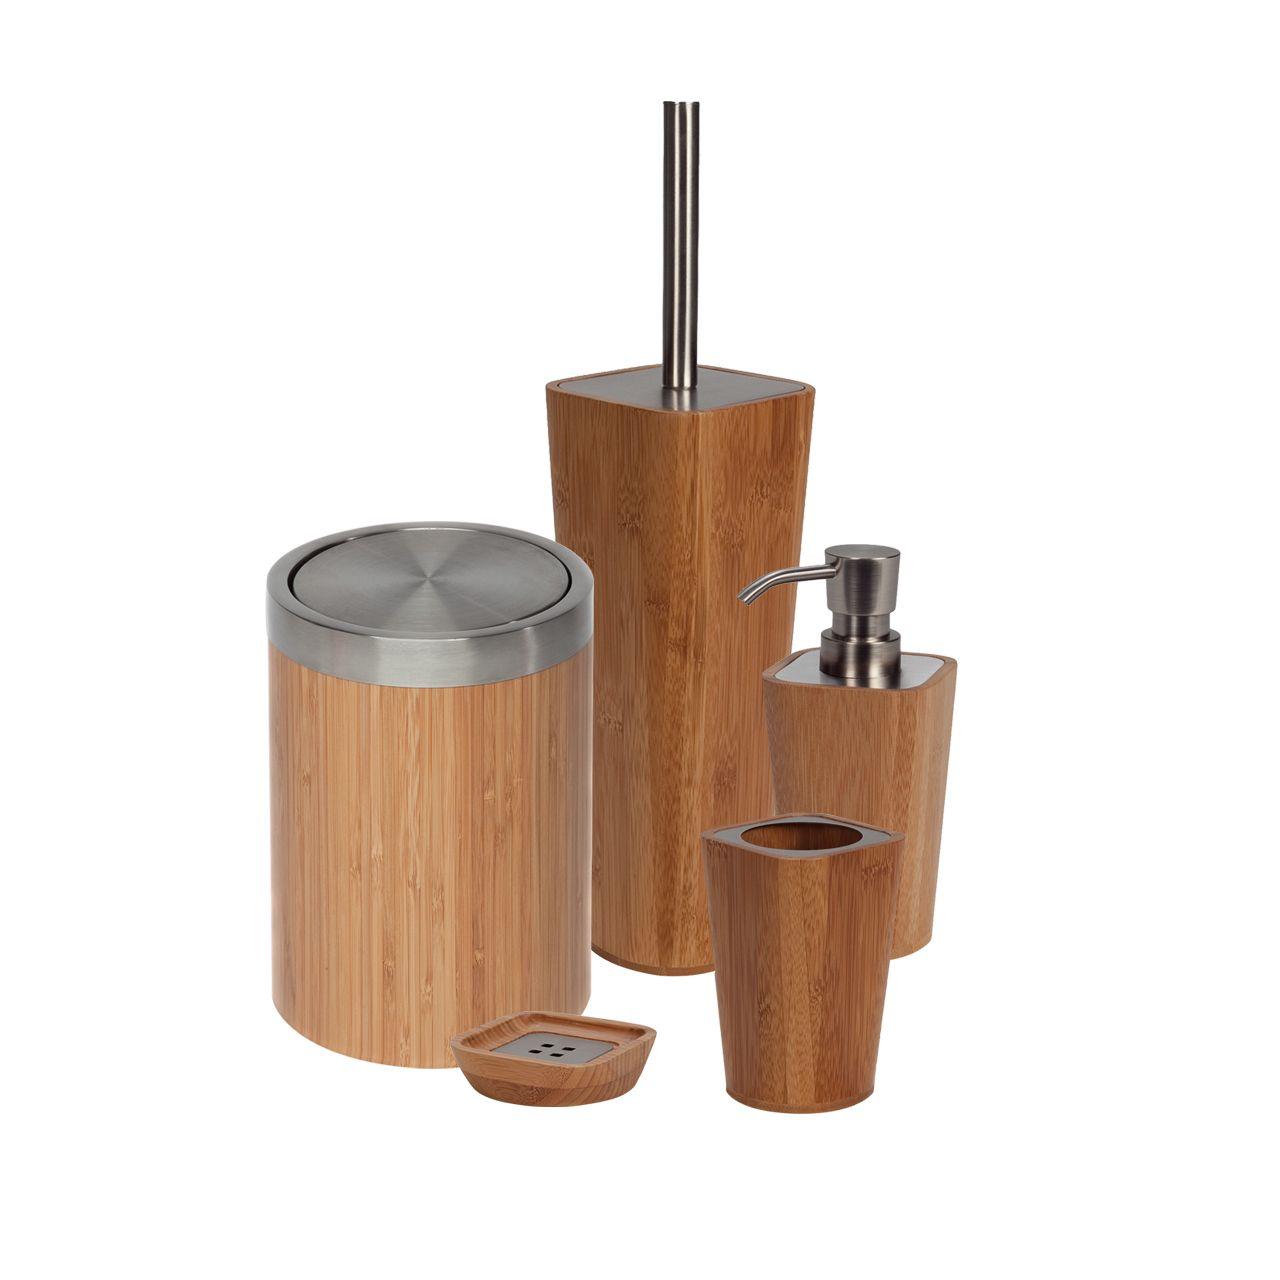 Bamboo Bathroom Accessories Spotlight  Training4Green Fair Bamboo Bathroom Accessories Review